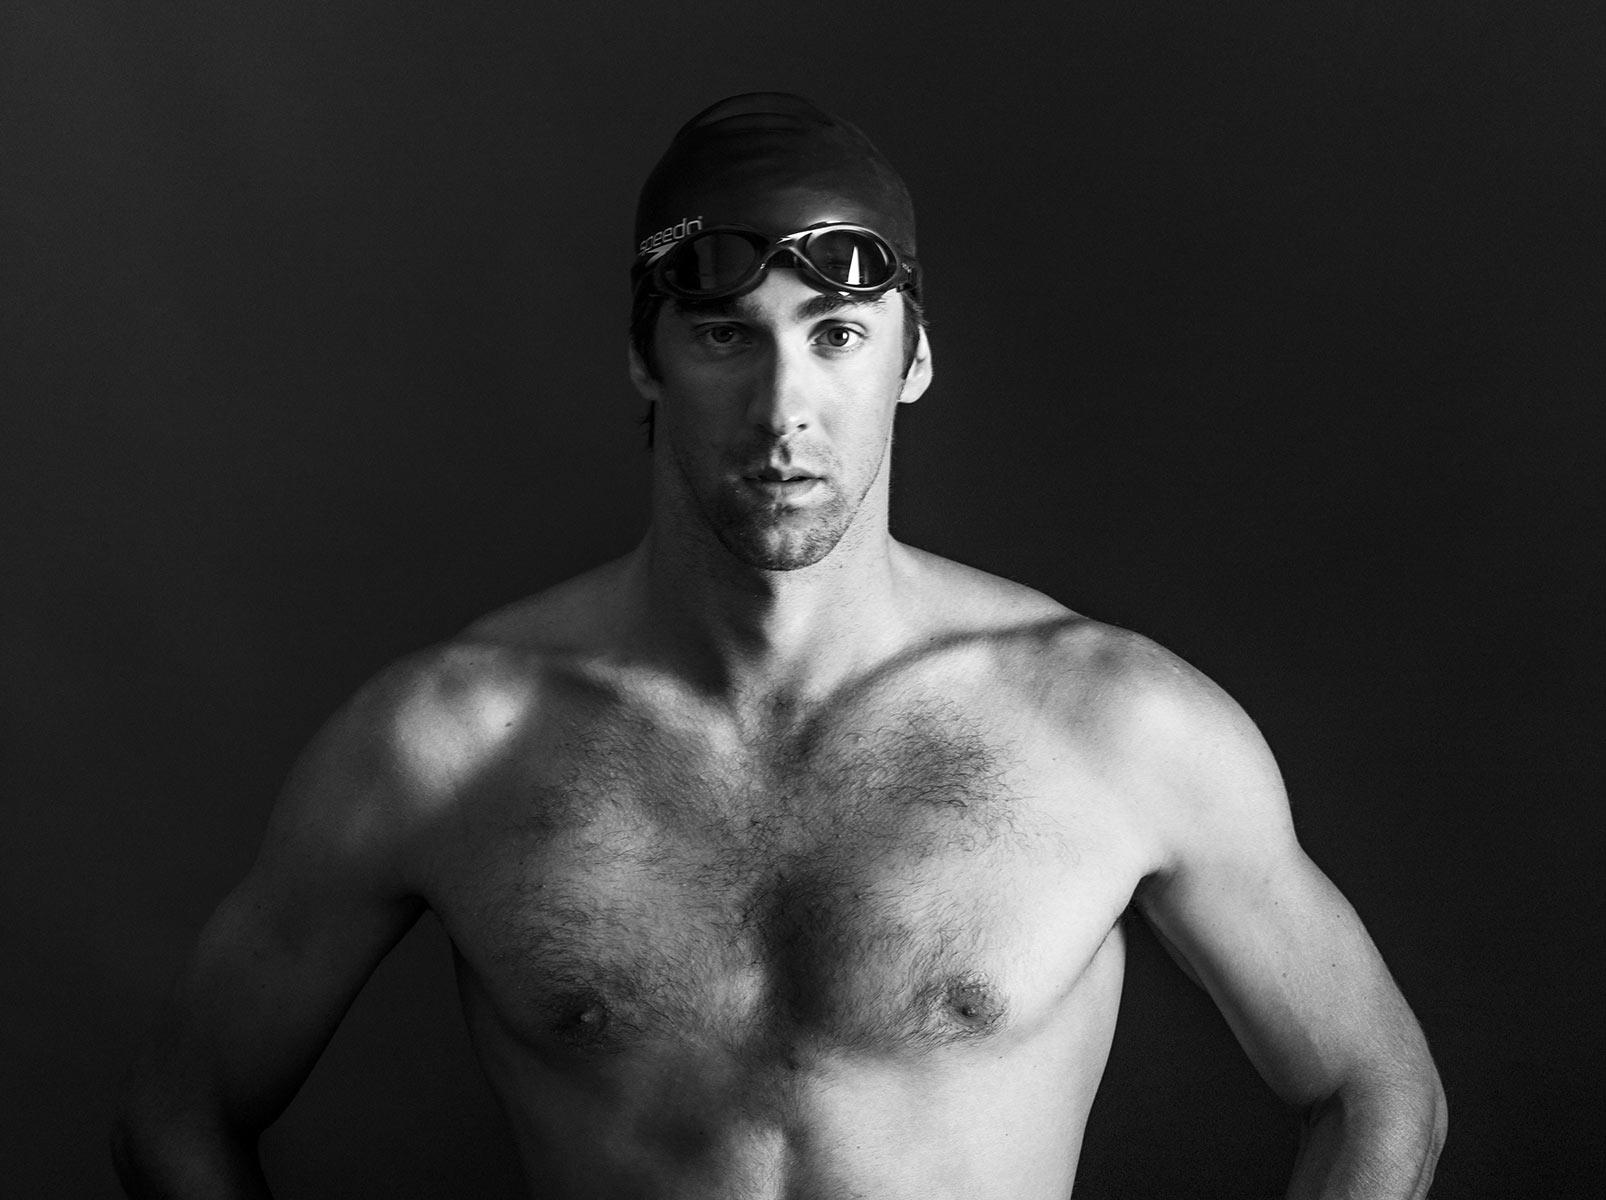 Michael Phelps - Olympic Gold Metalist